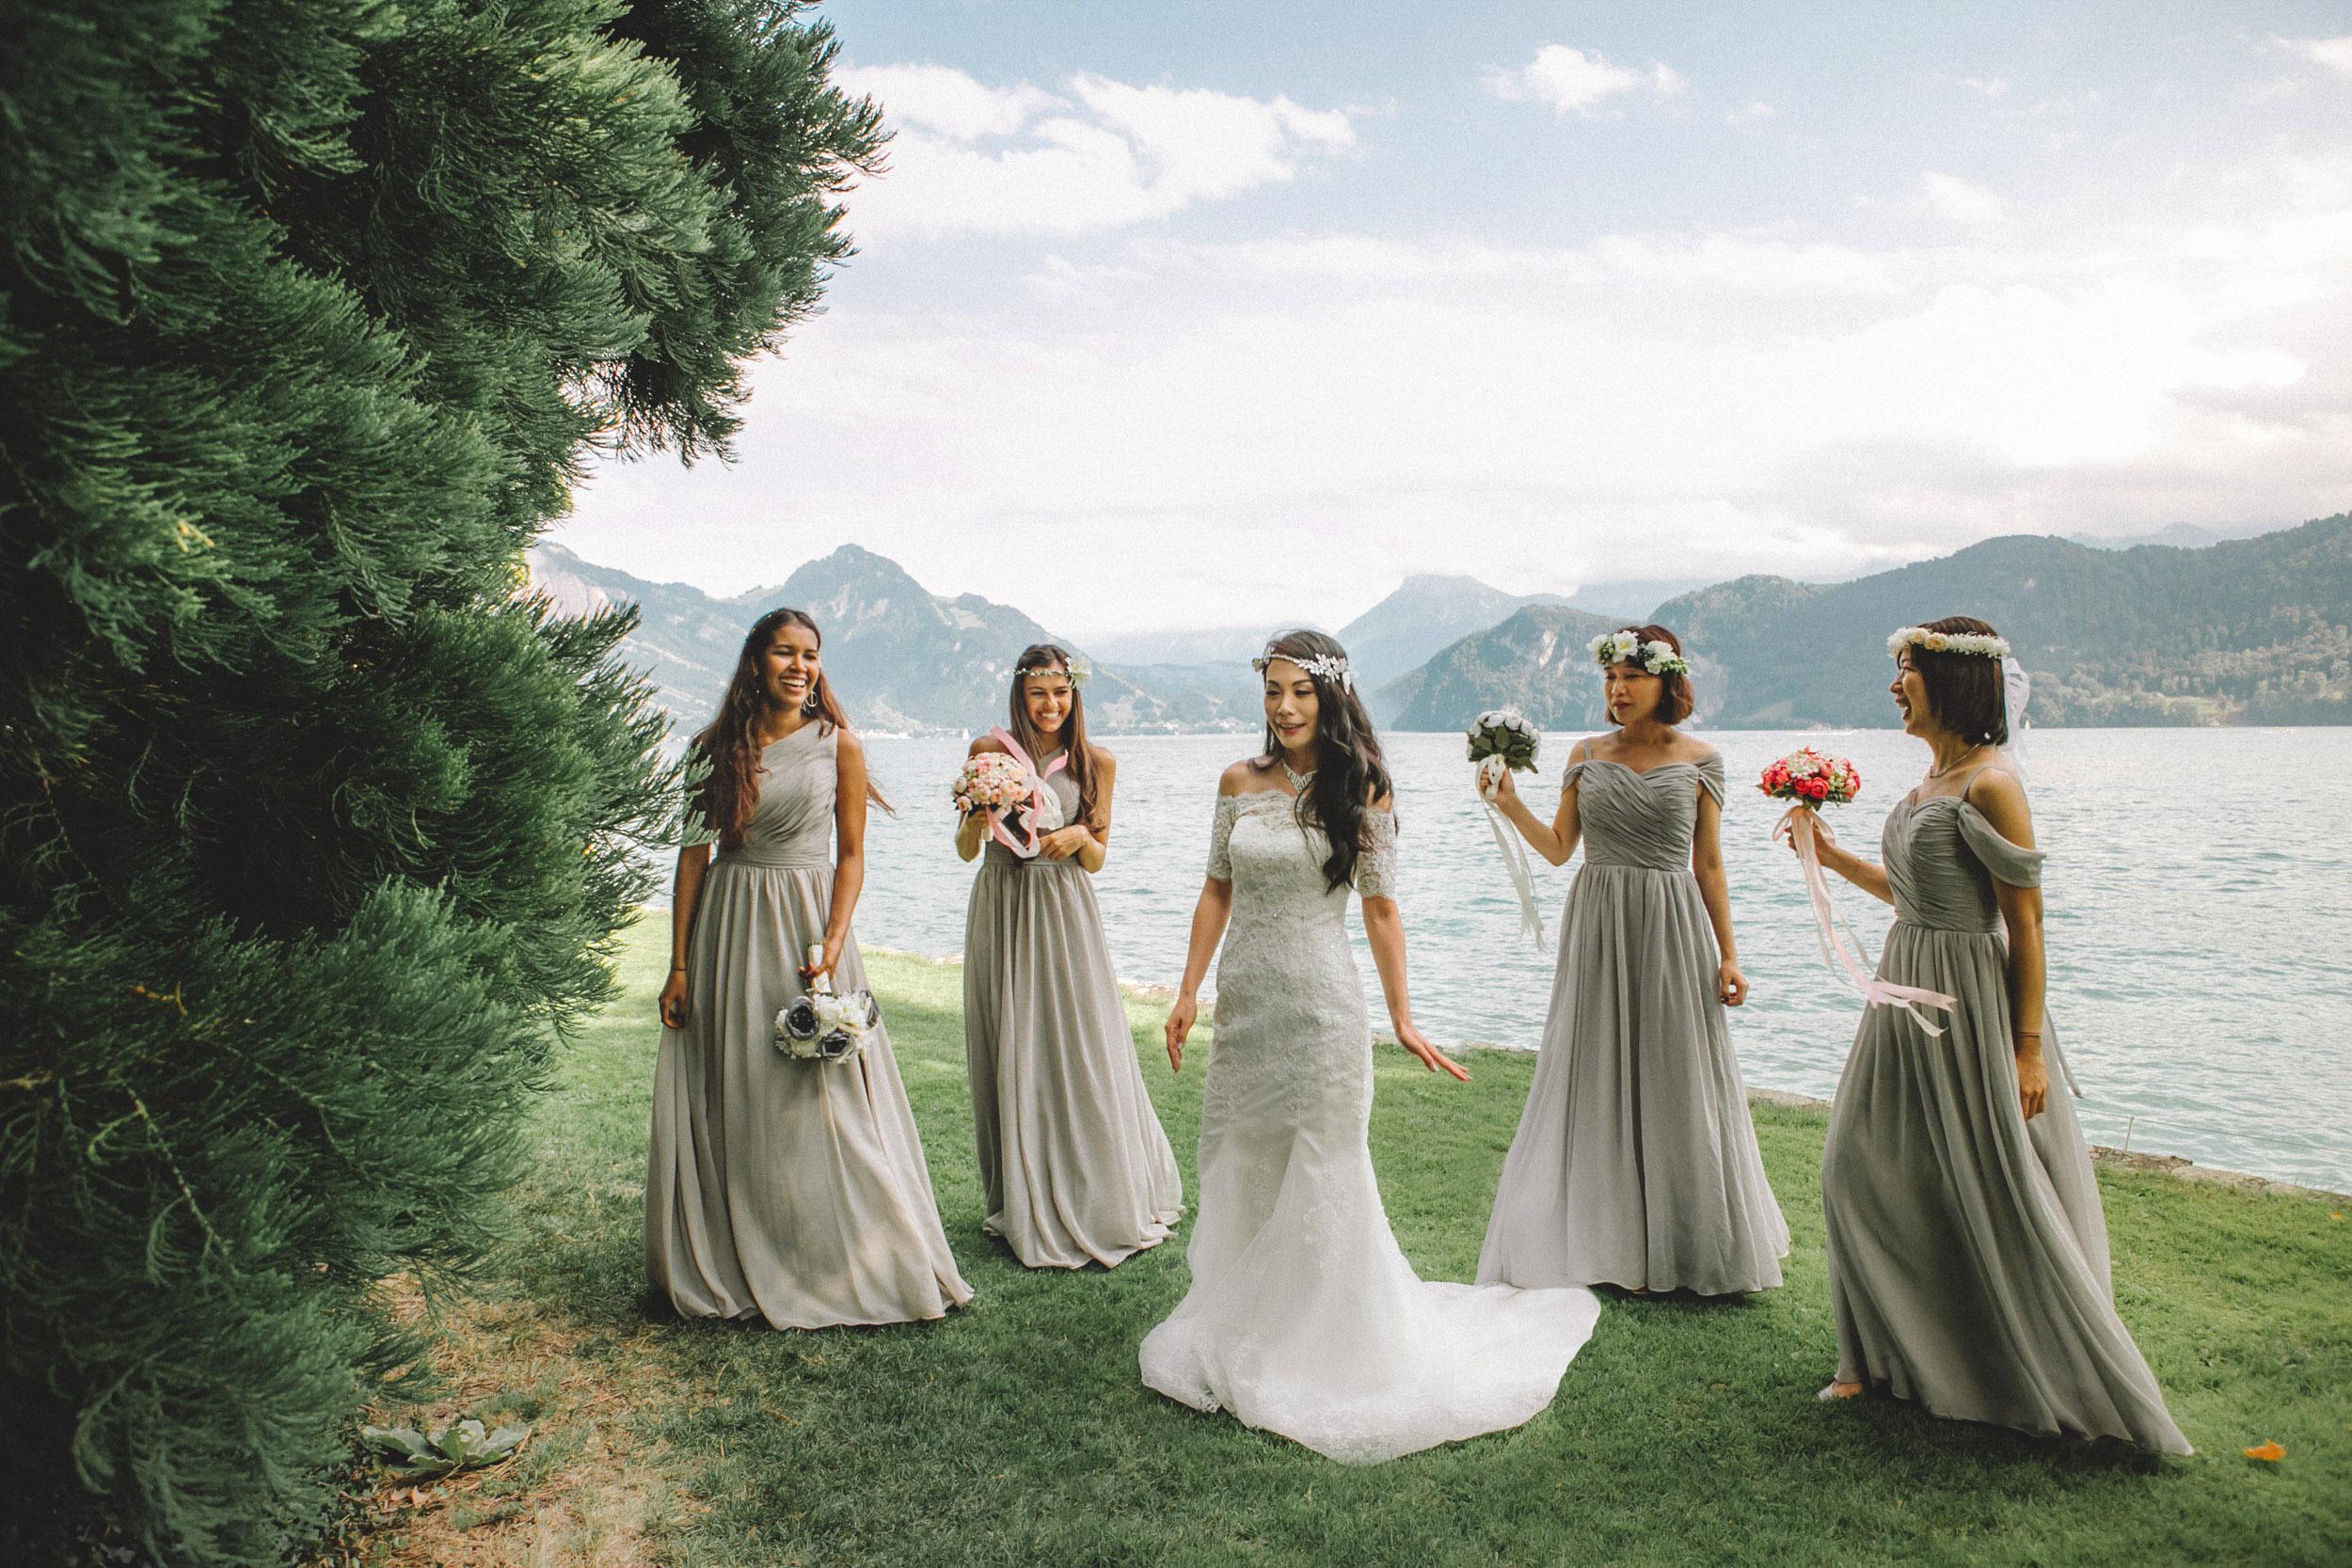 hochzeitsfotografie-schweiz_wedding-photographer-switzerland-europe_Bendik-Photography-021